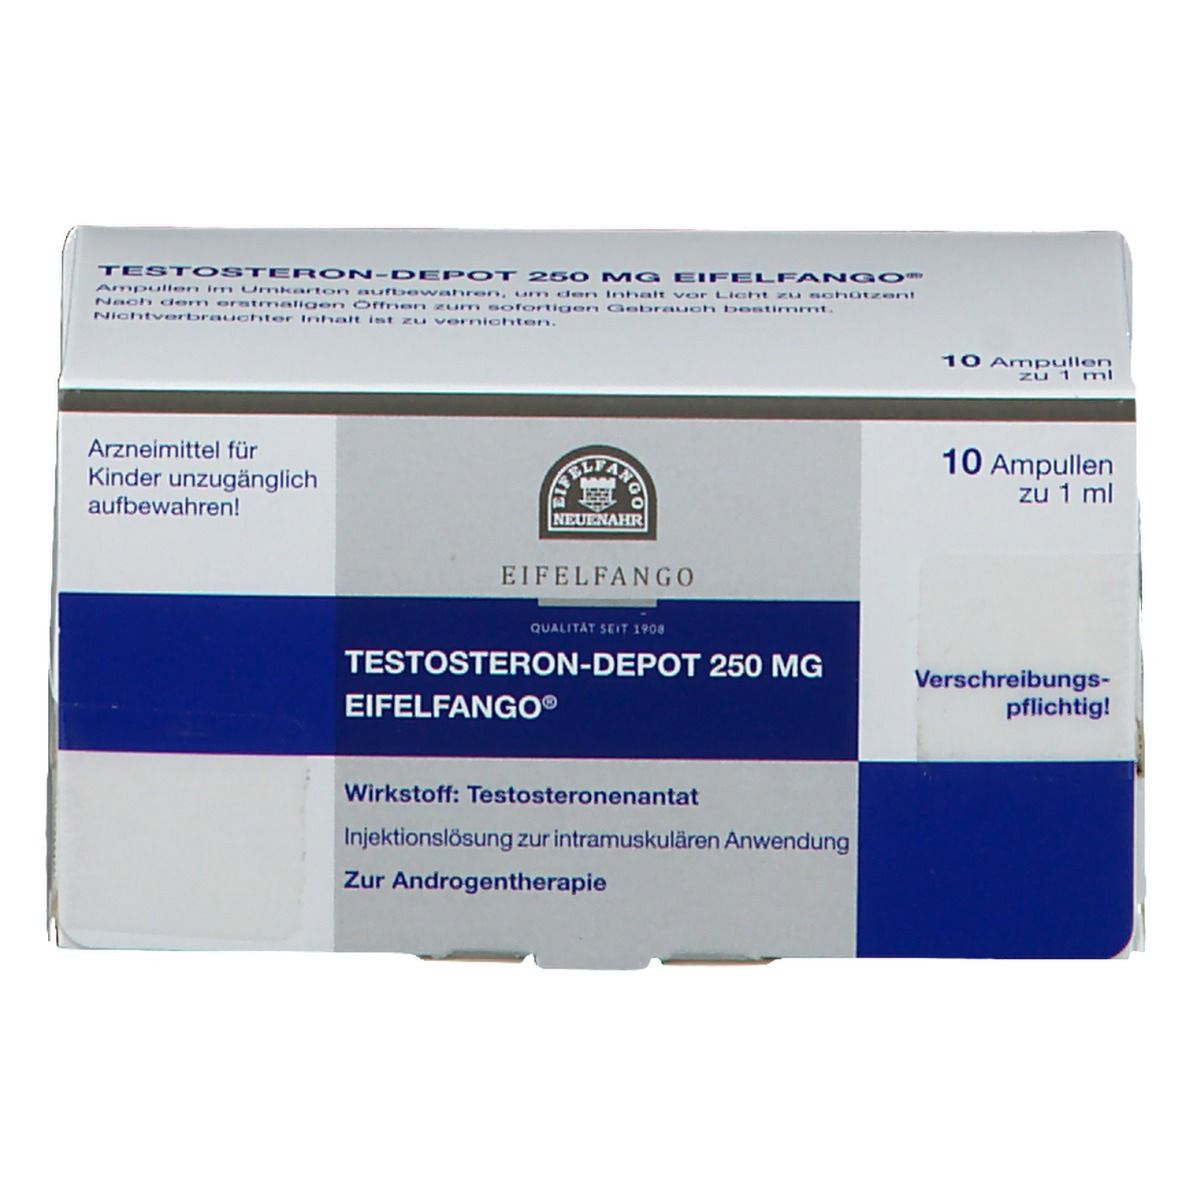 TESTOSTERON depot 250 mg Eifelfango Ampullen 10X1 ml